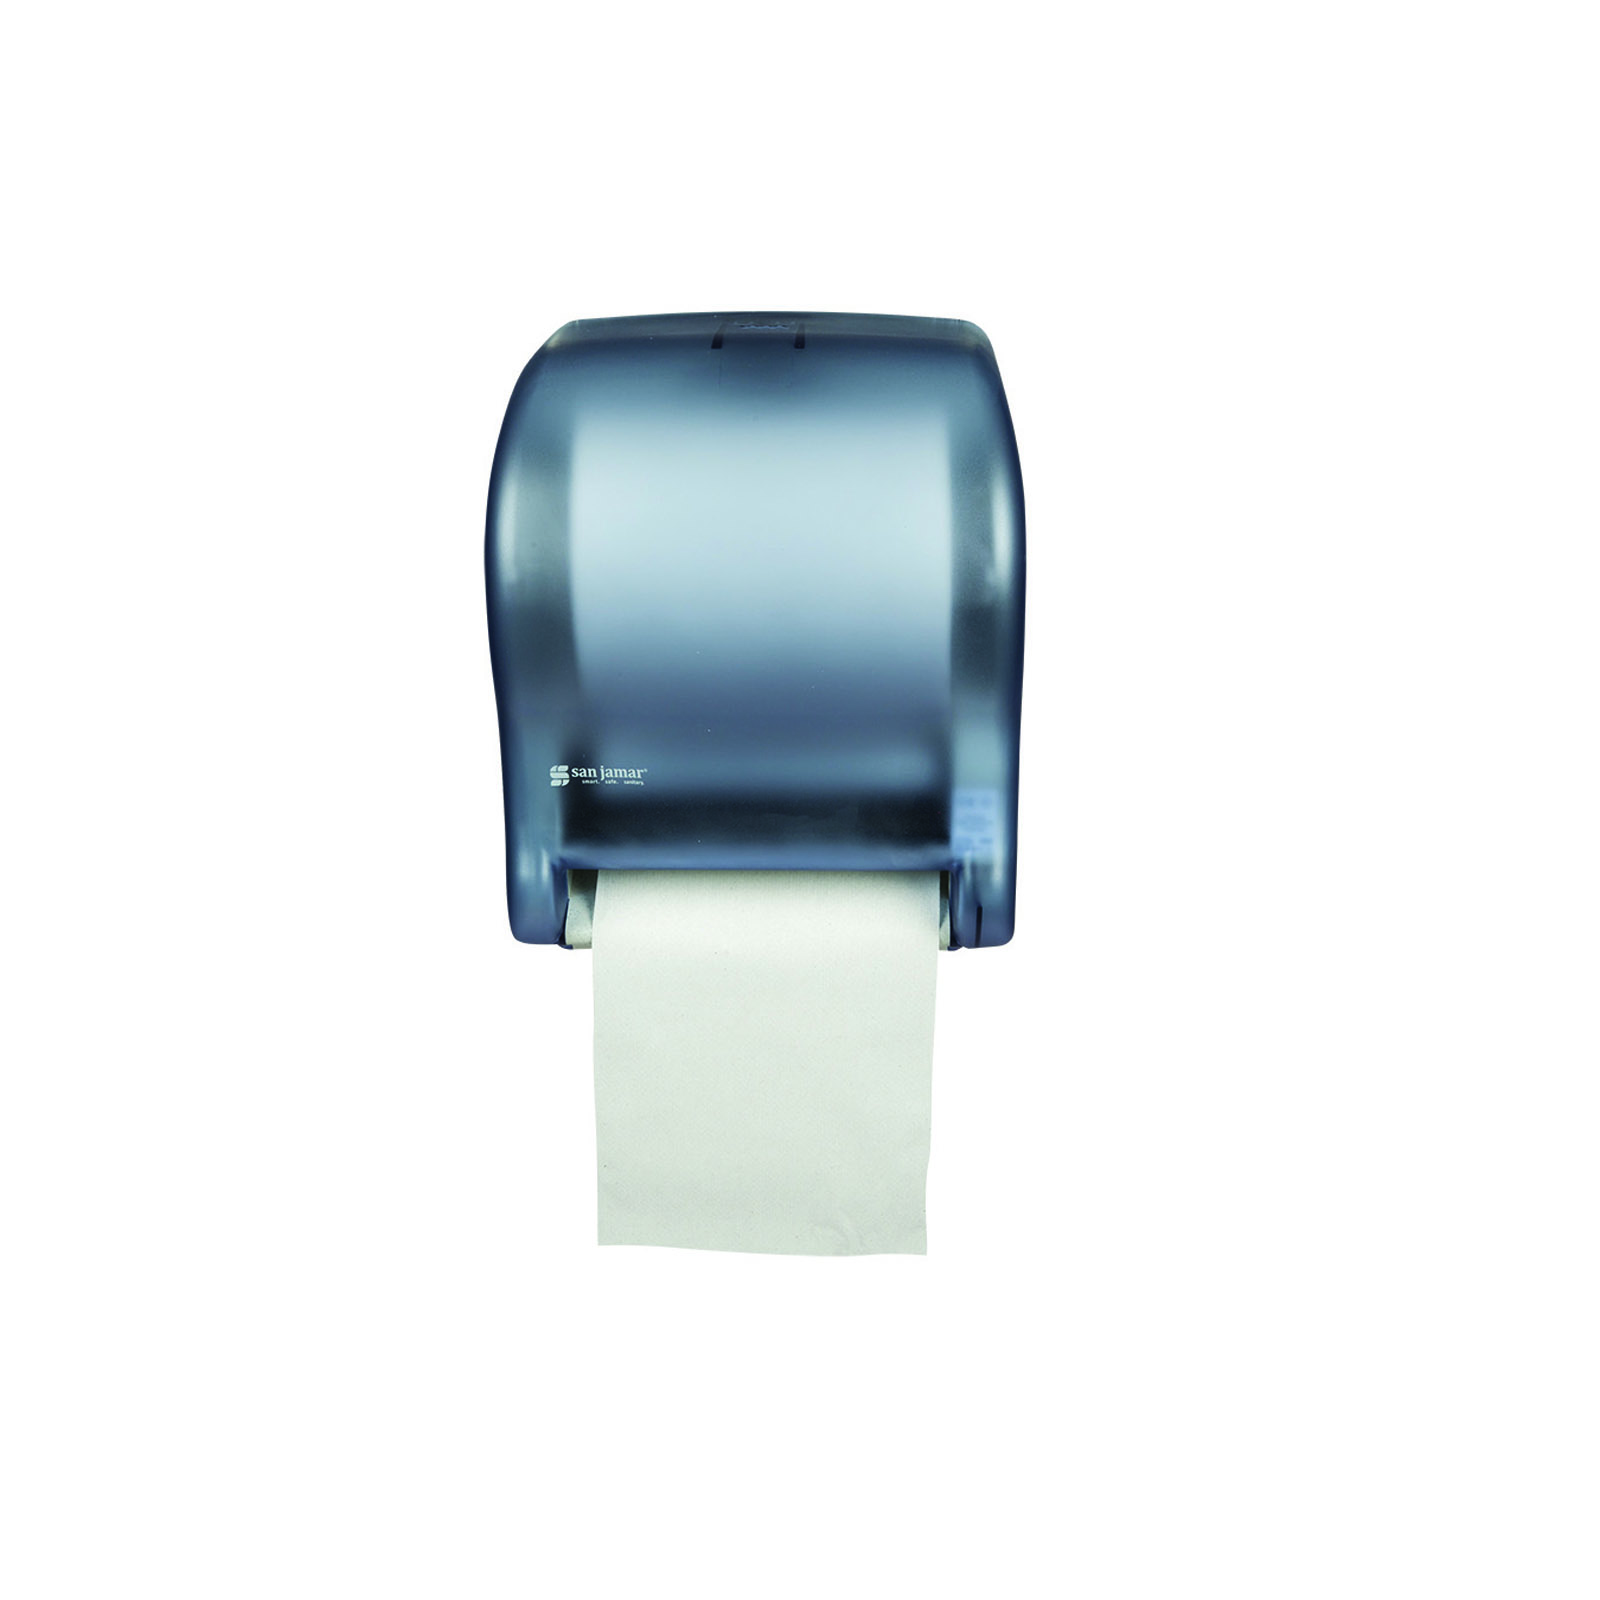 San Jamar T8000TBL paper towel dispenser